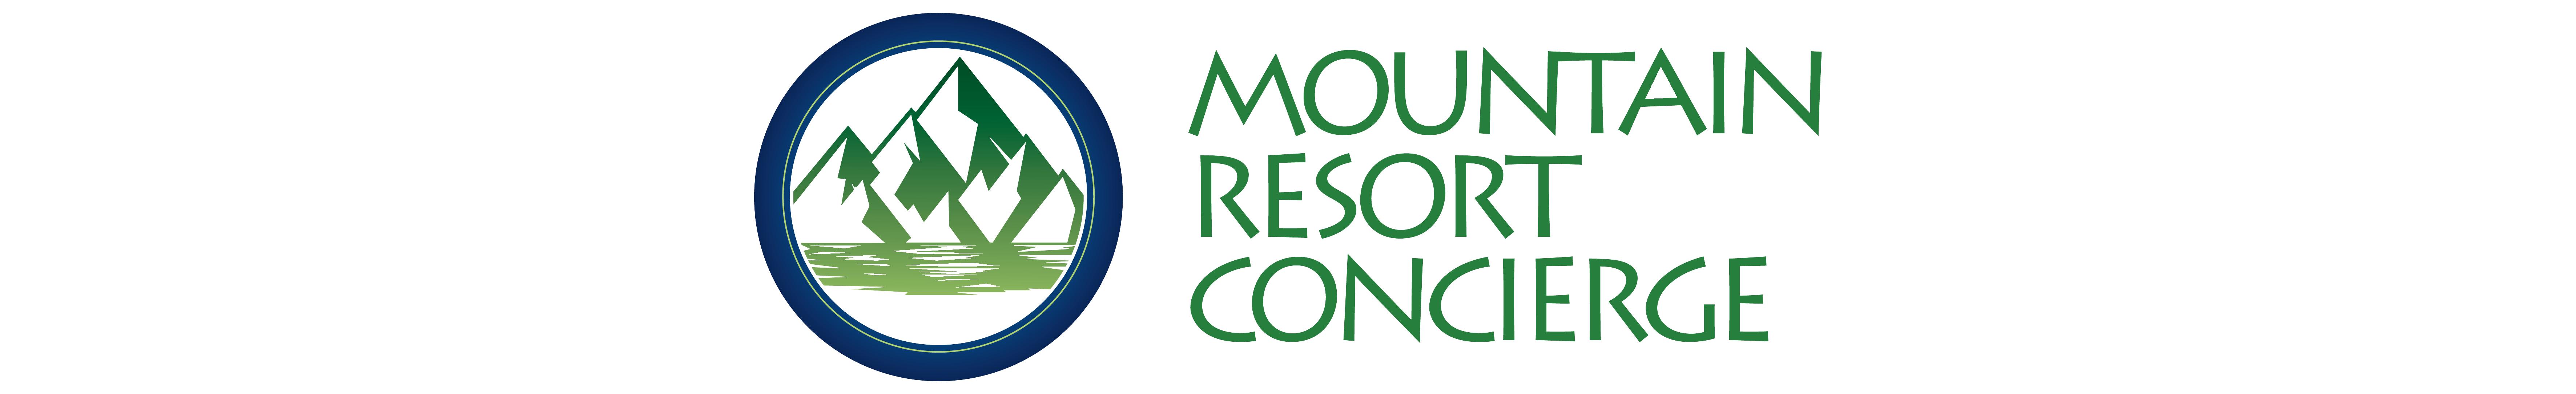 mountain resort concierge